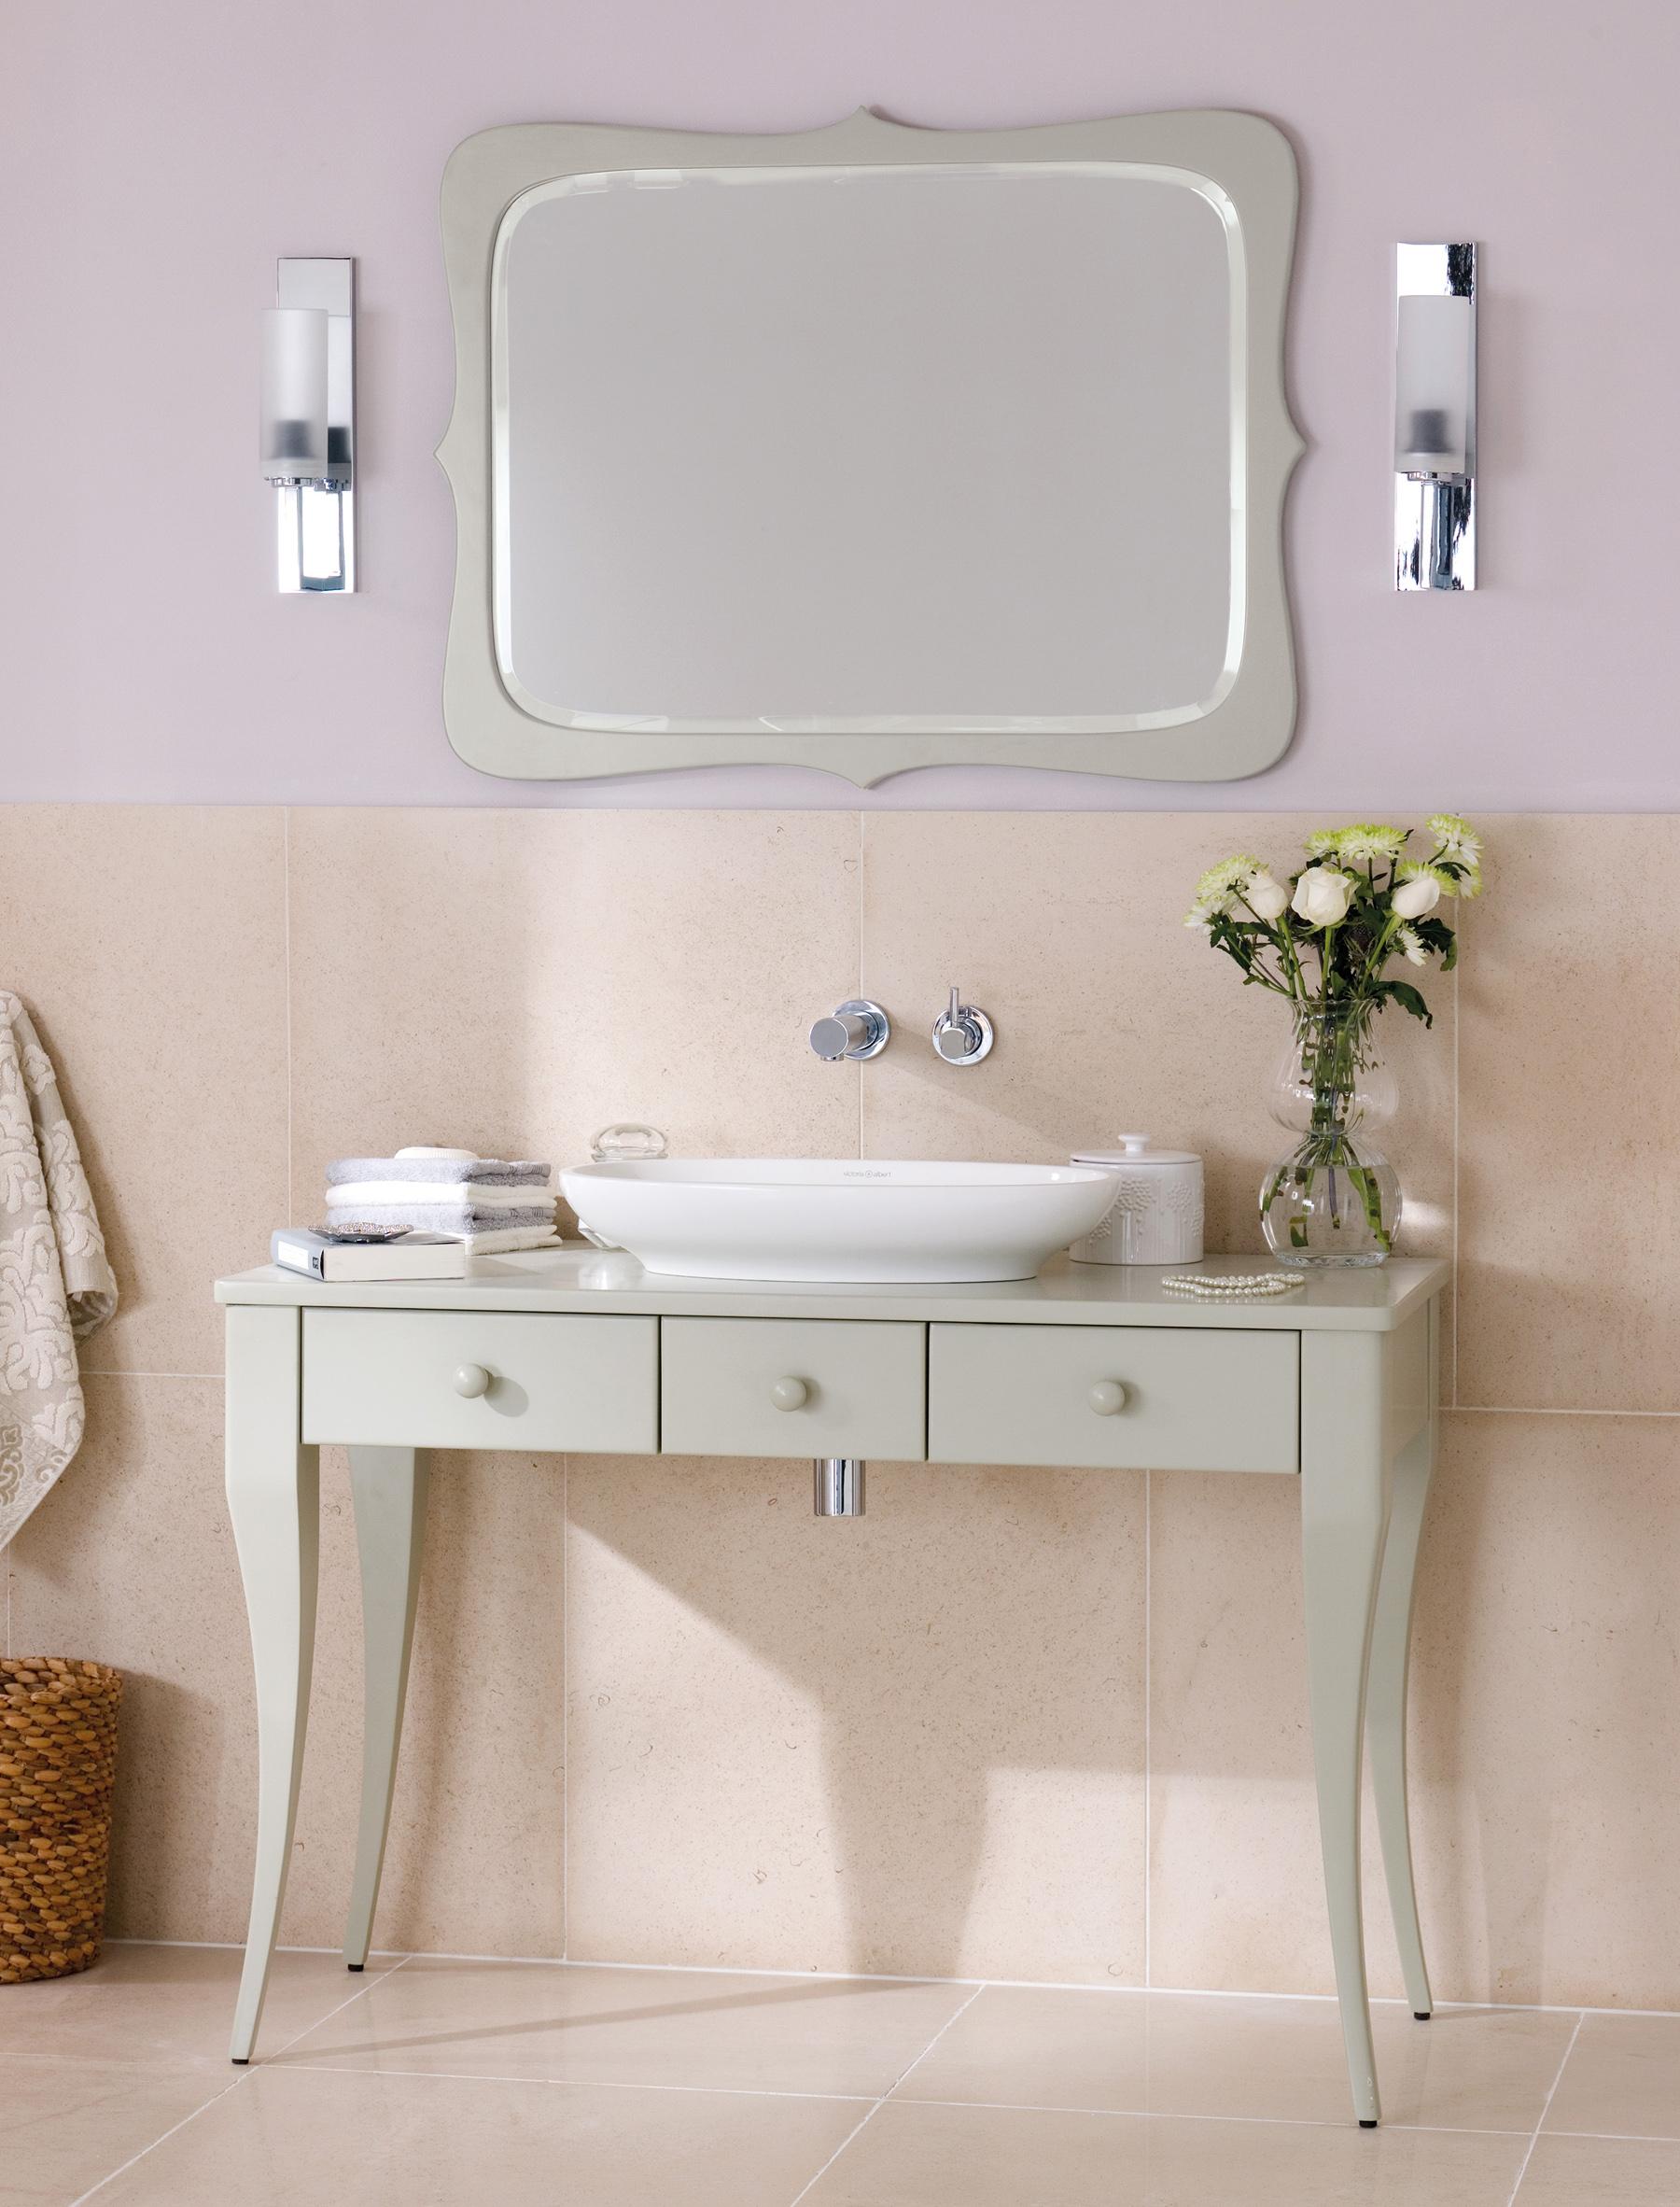 Bosa Vanity & Levanto Mirror from V+A Baths | Photo courtesy V+A Baths